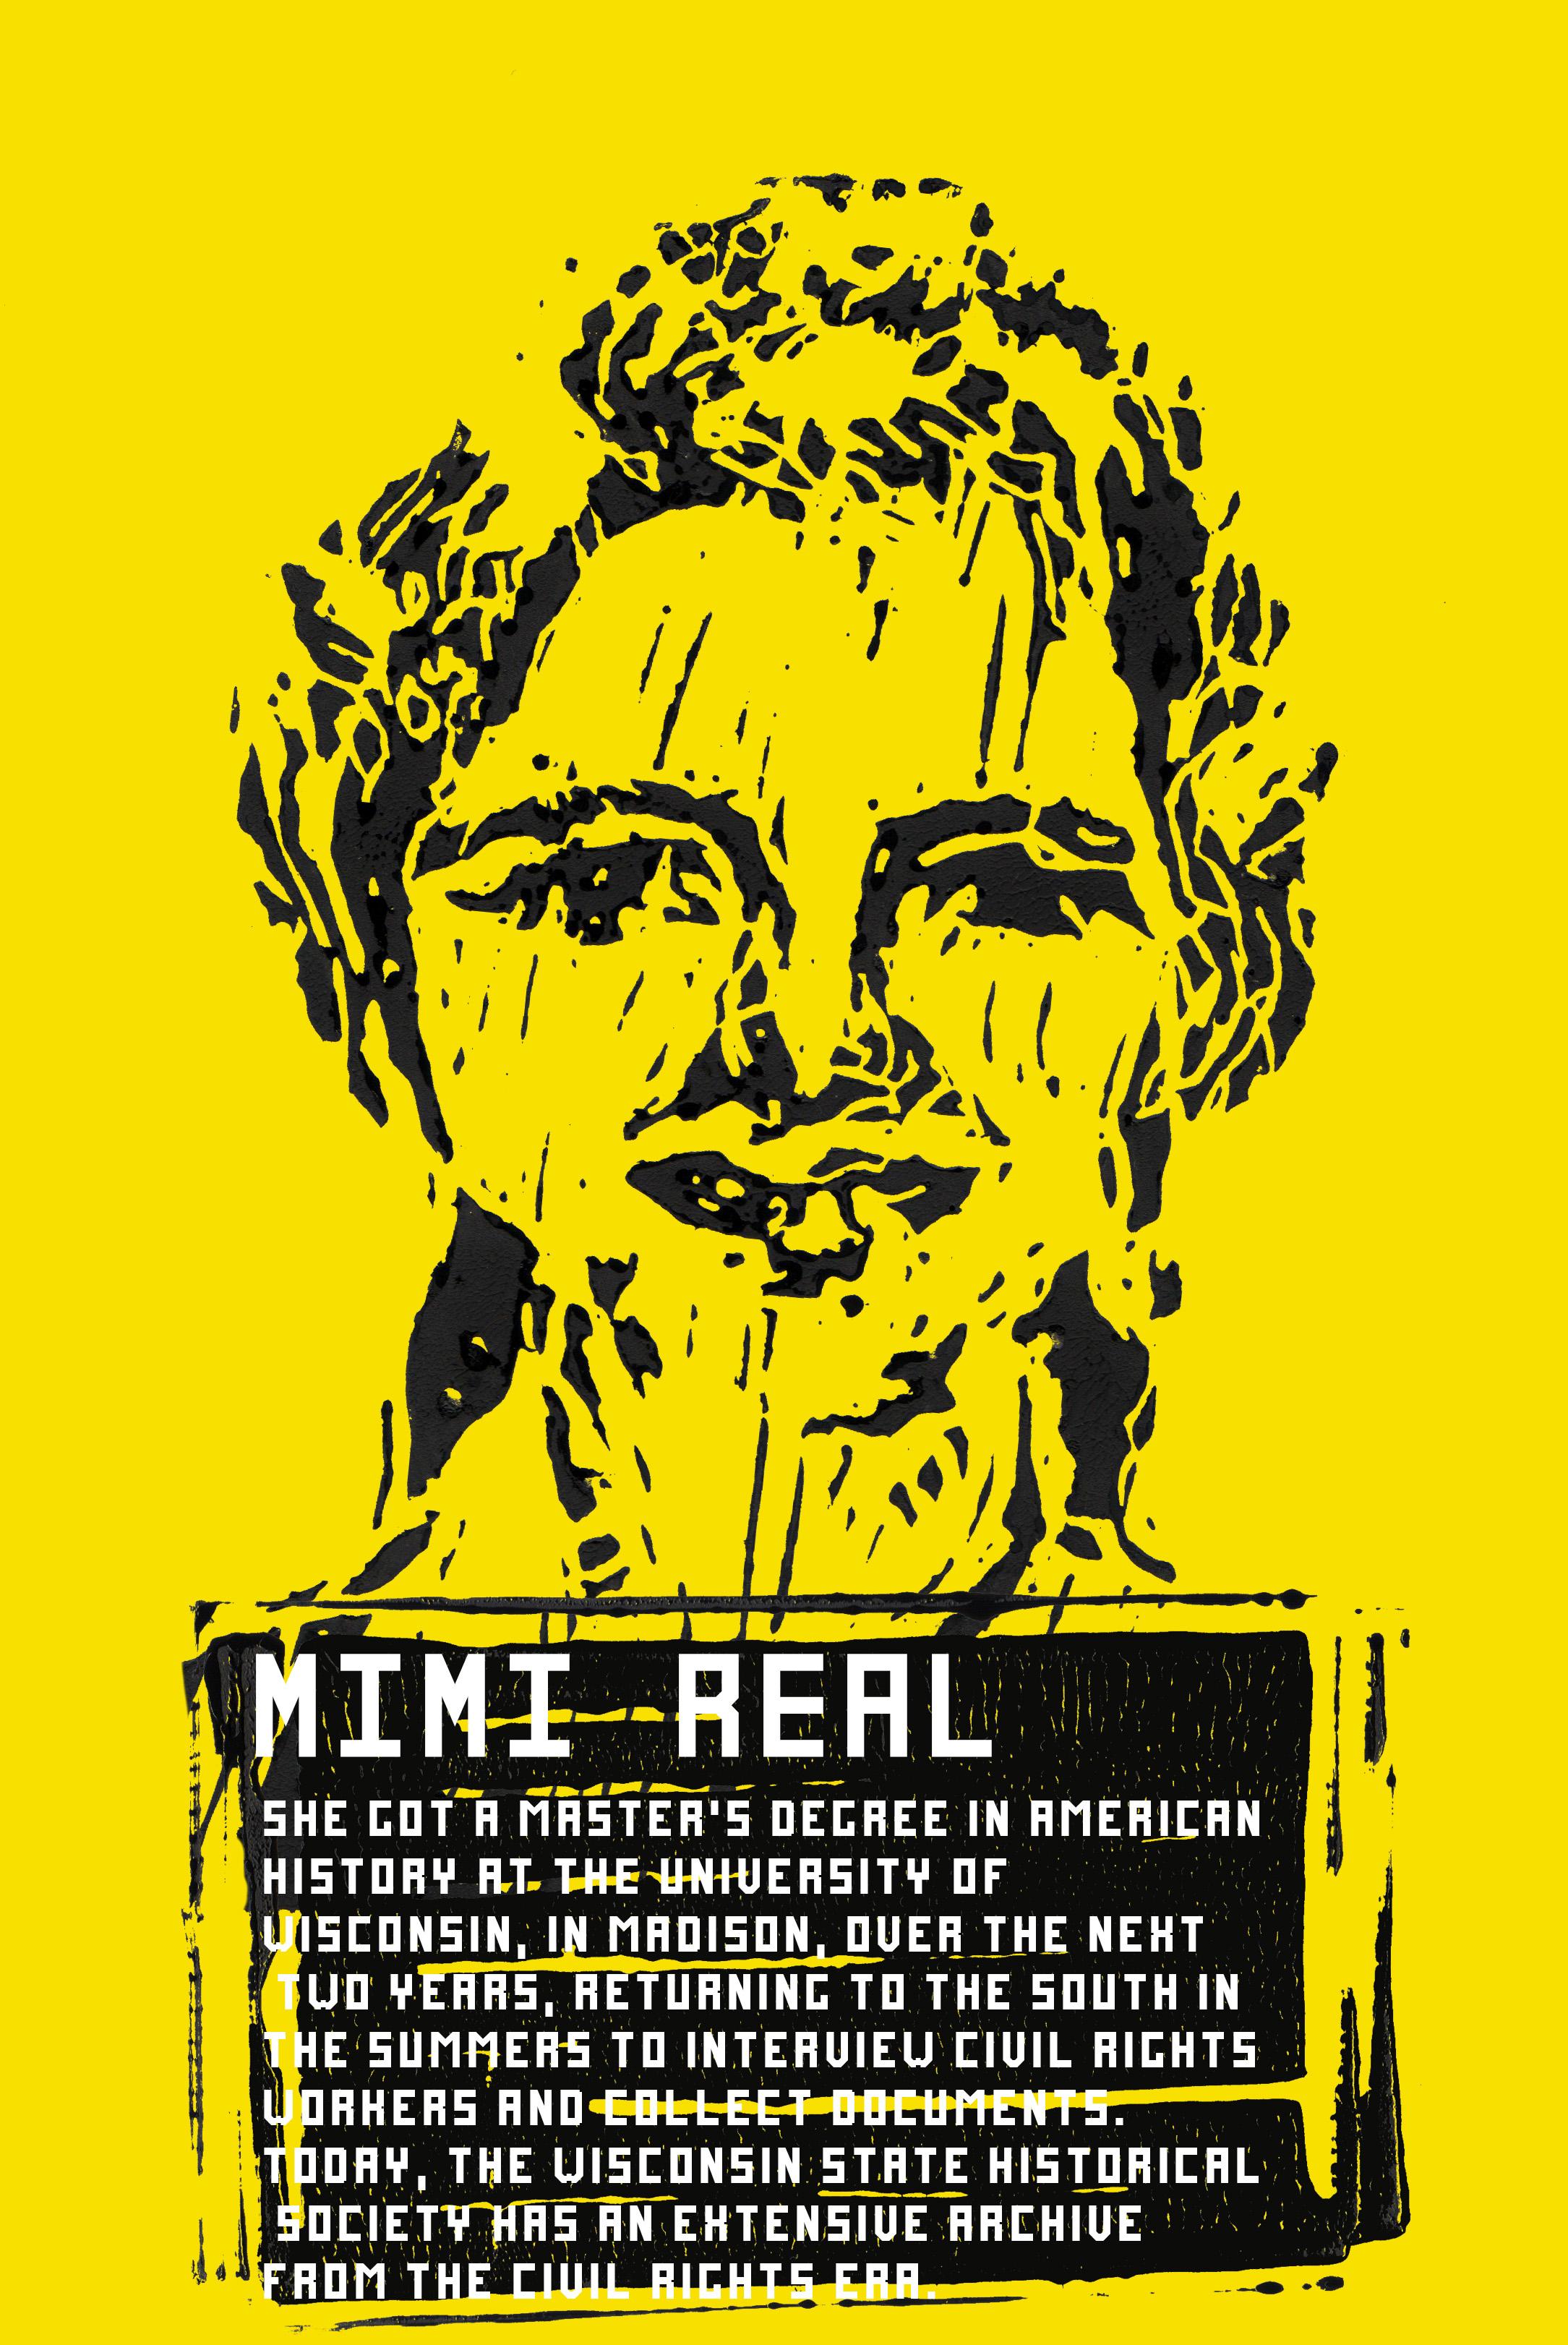 Mimi Real